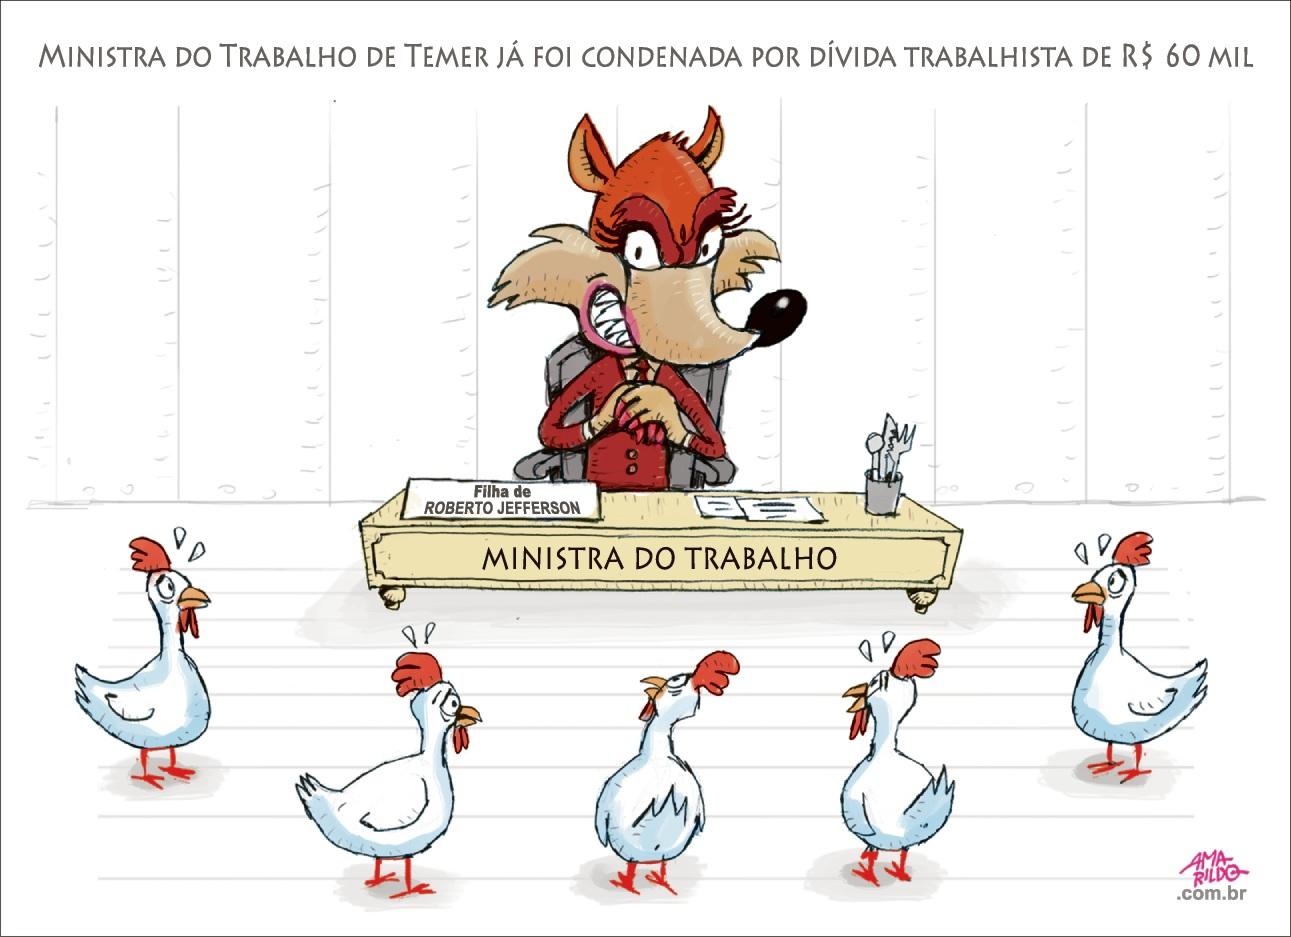 Charge do Amarildo - 05/01/2018. Crédito: Amarildo